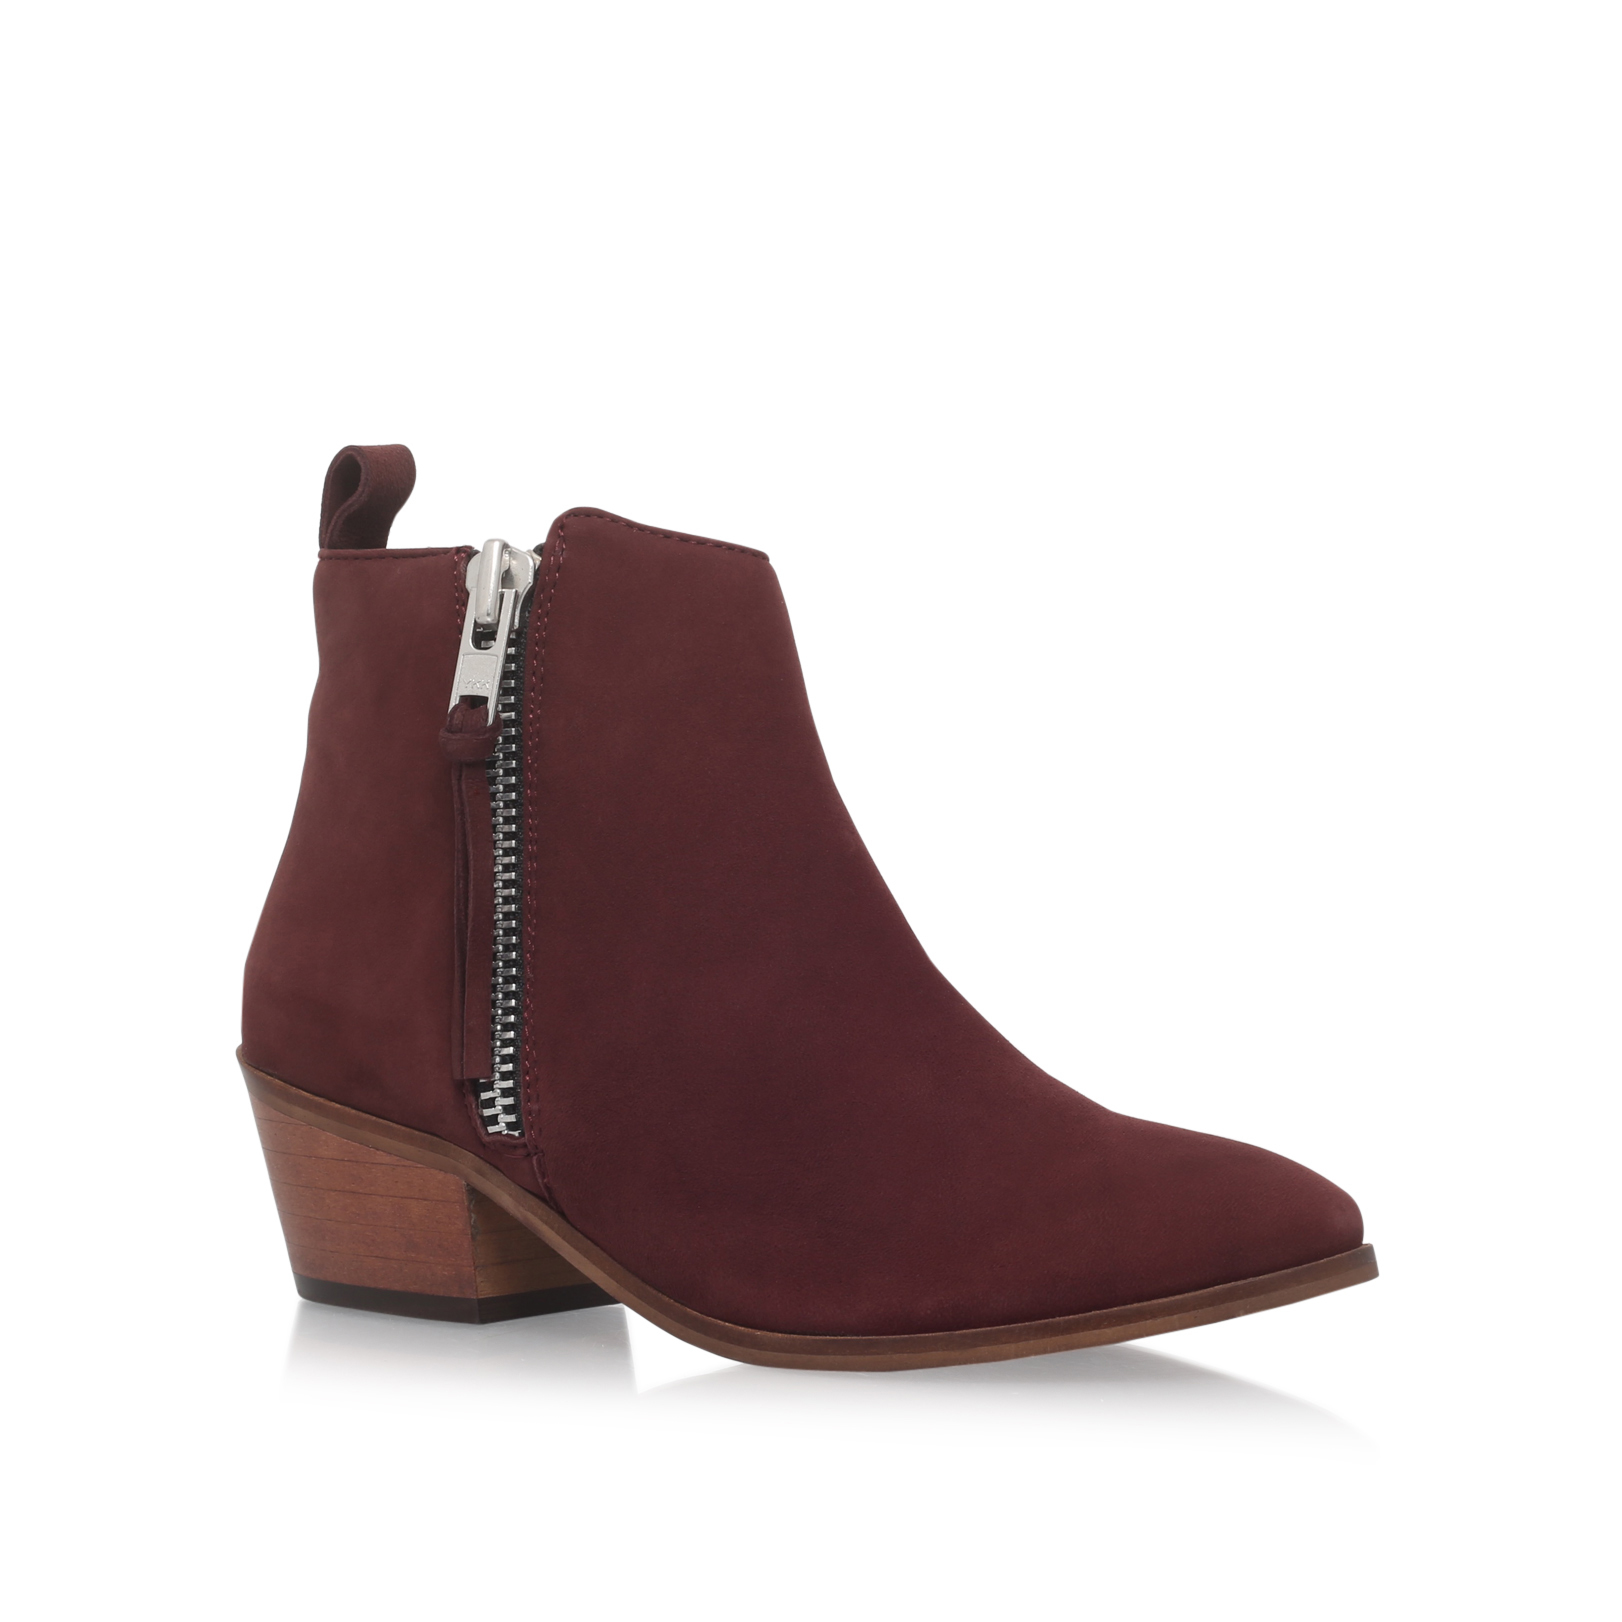 Kurt Geiger Shoes Co Uk